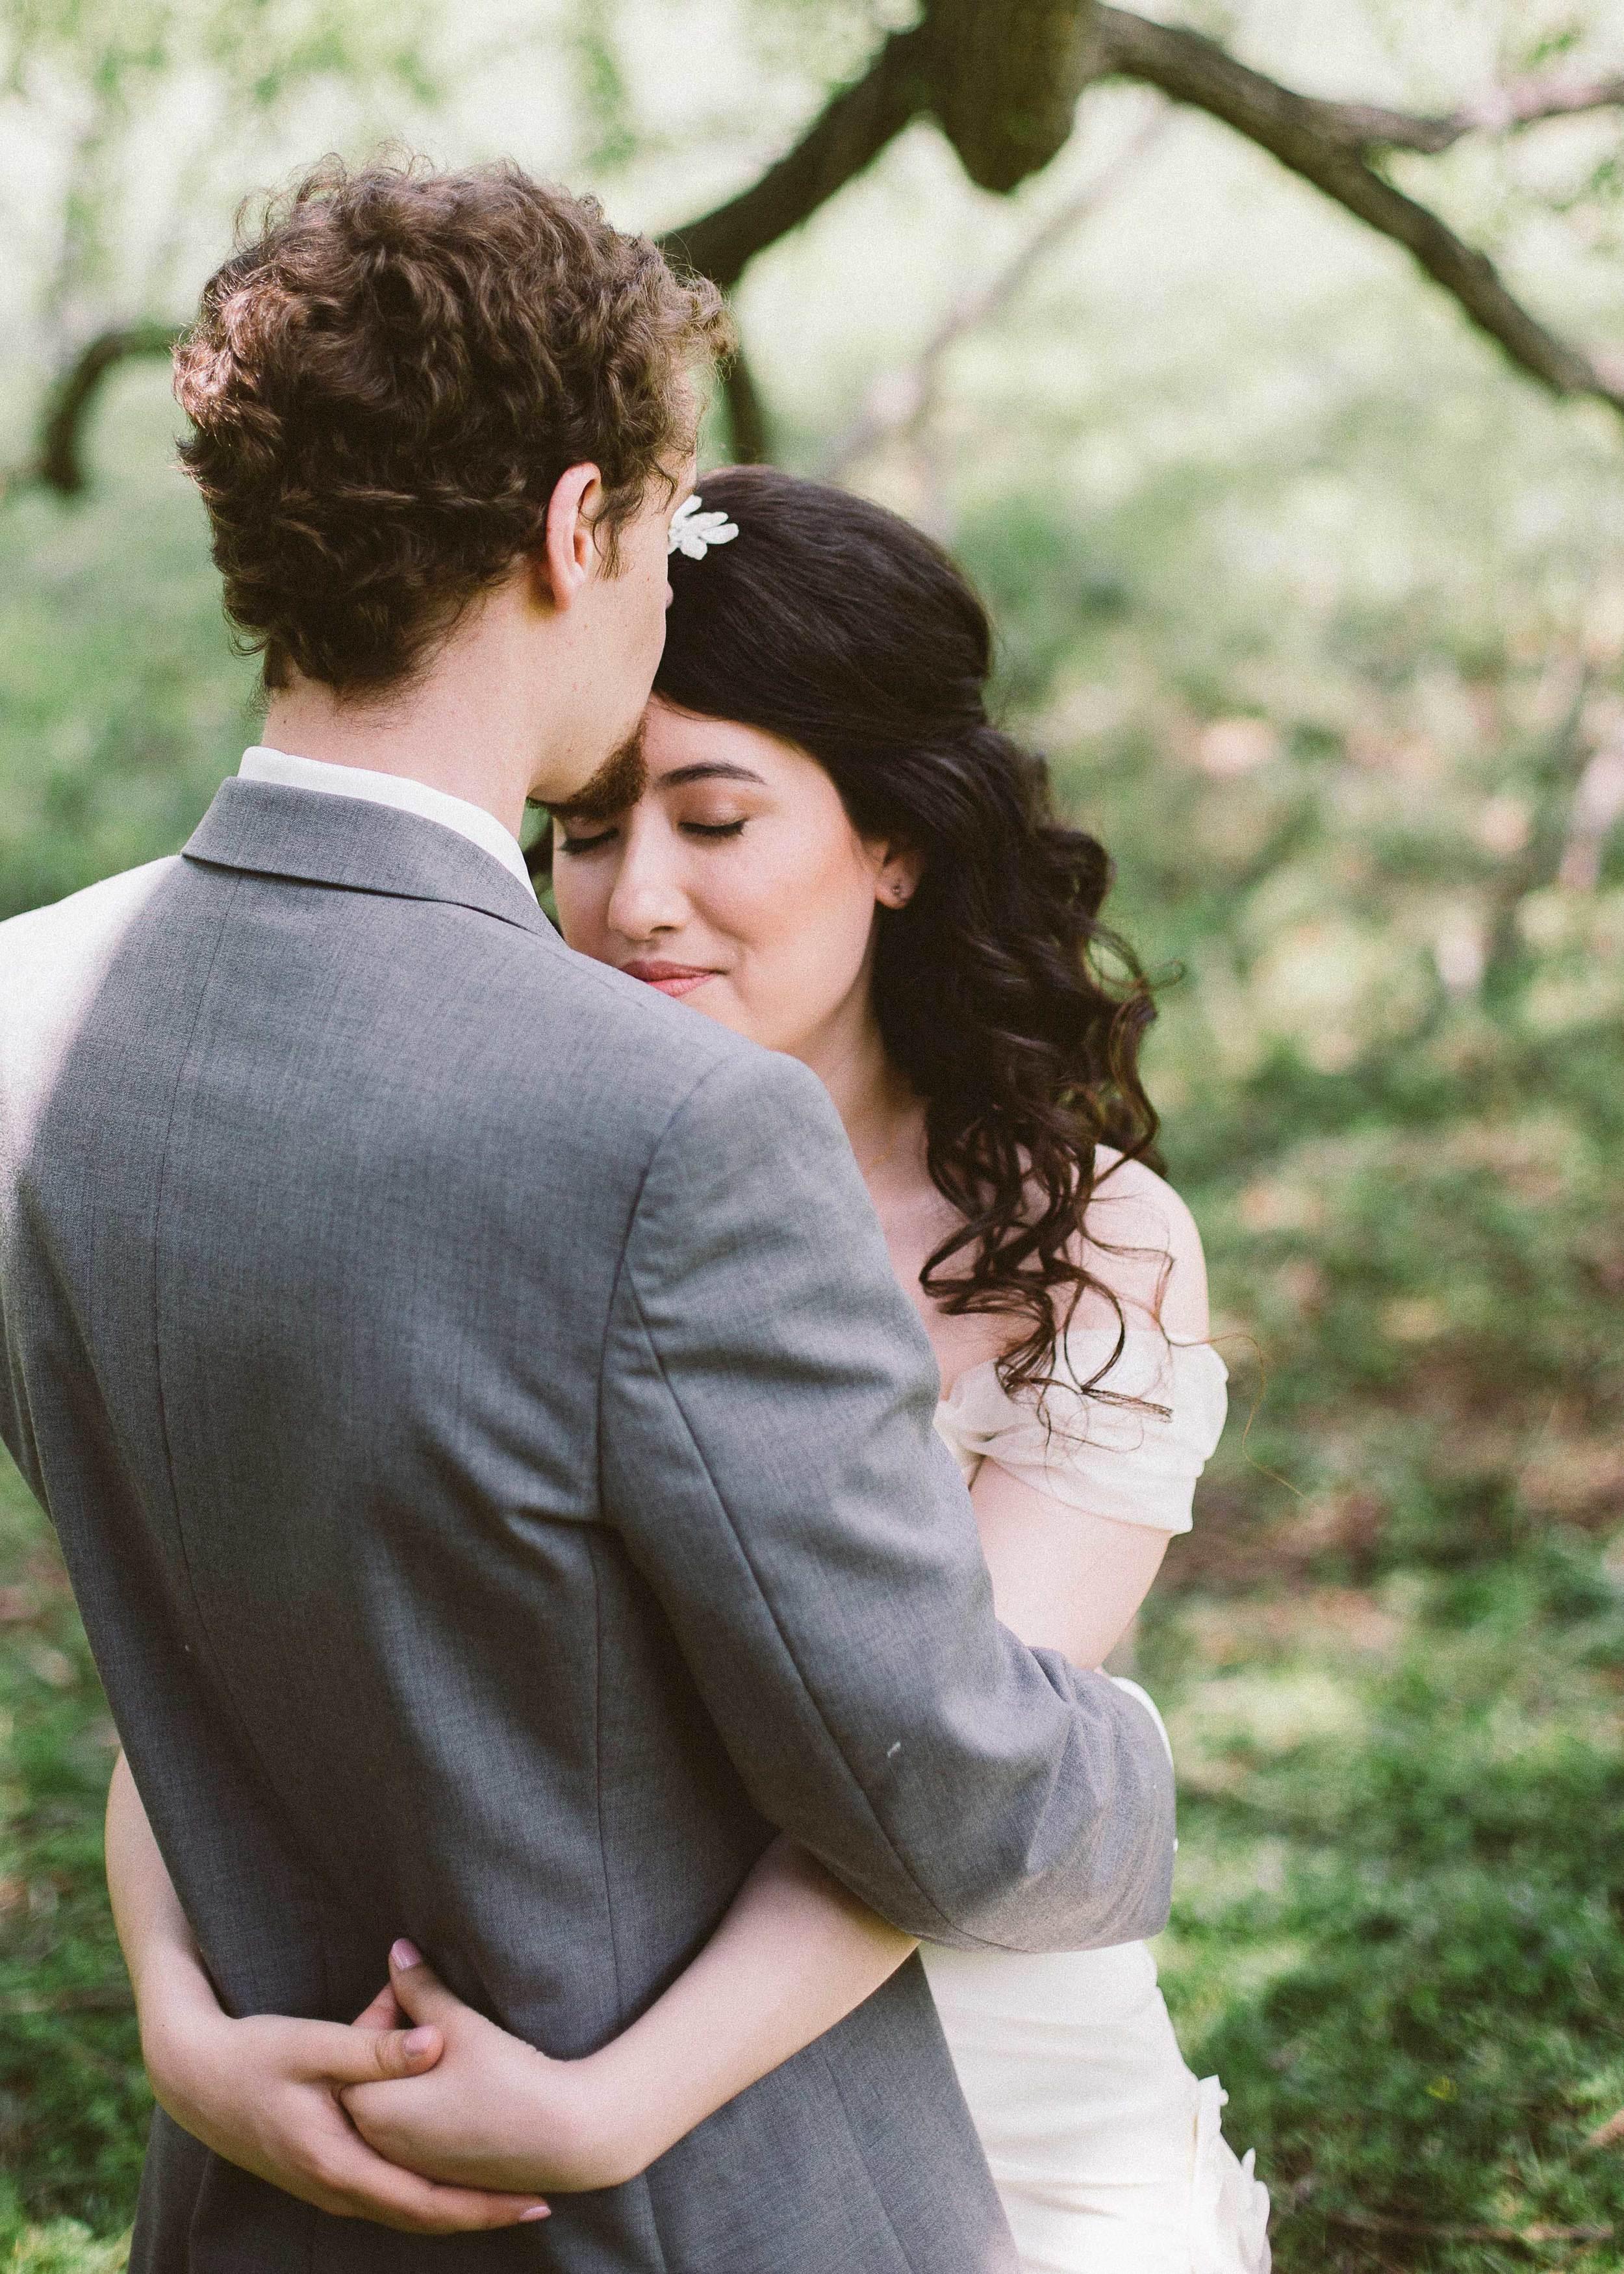 Radka-Wedding-Radka-April-18-2015-0139.jpg